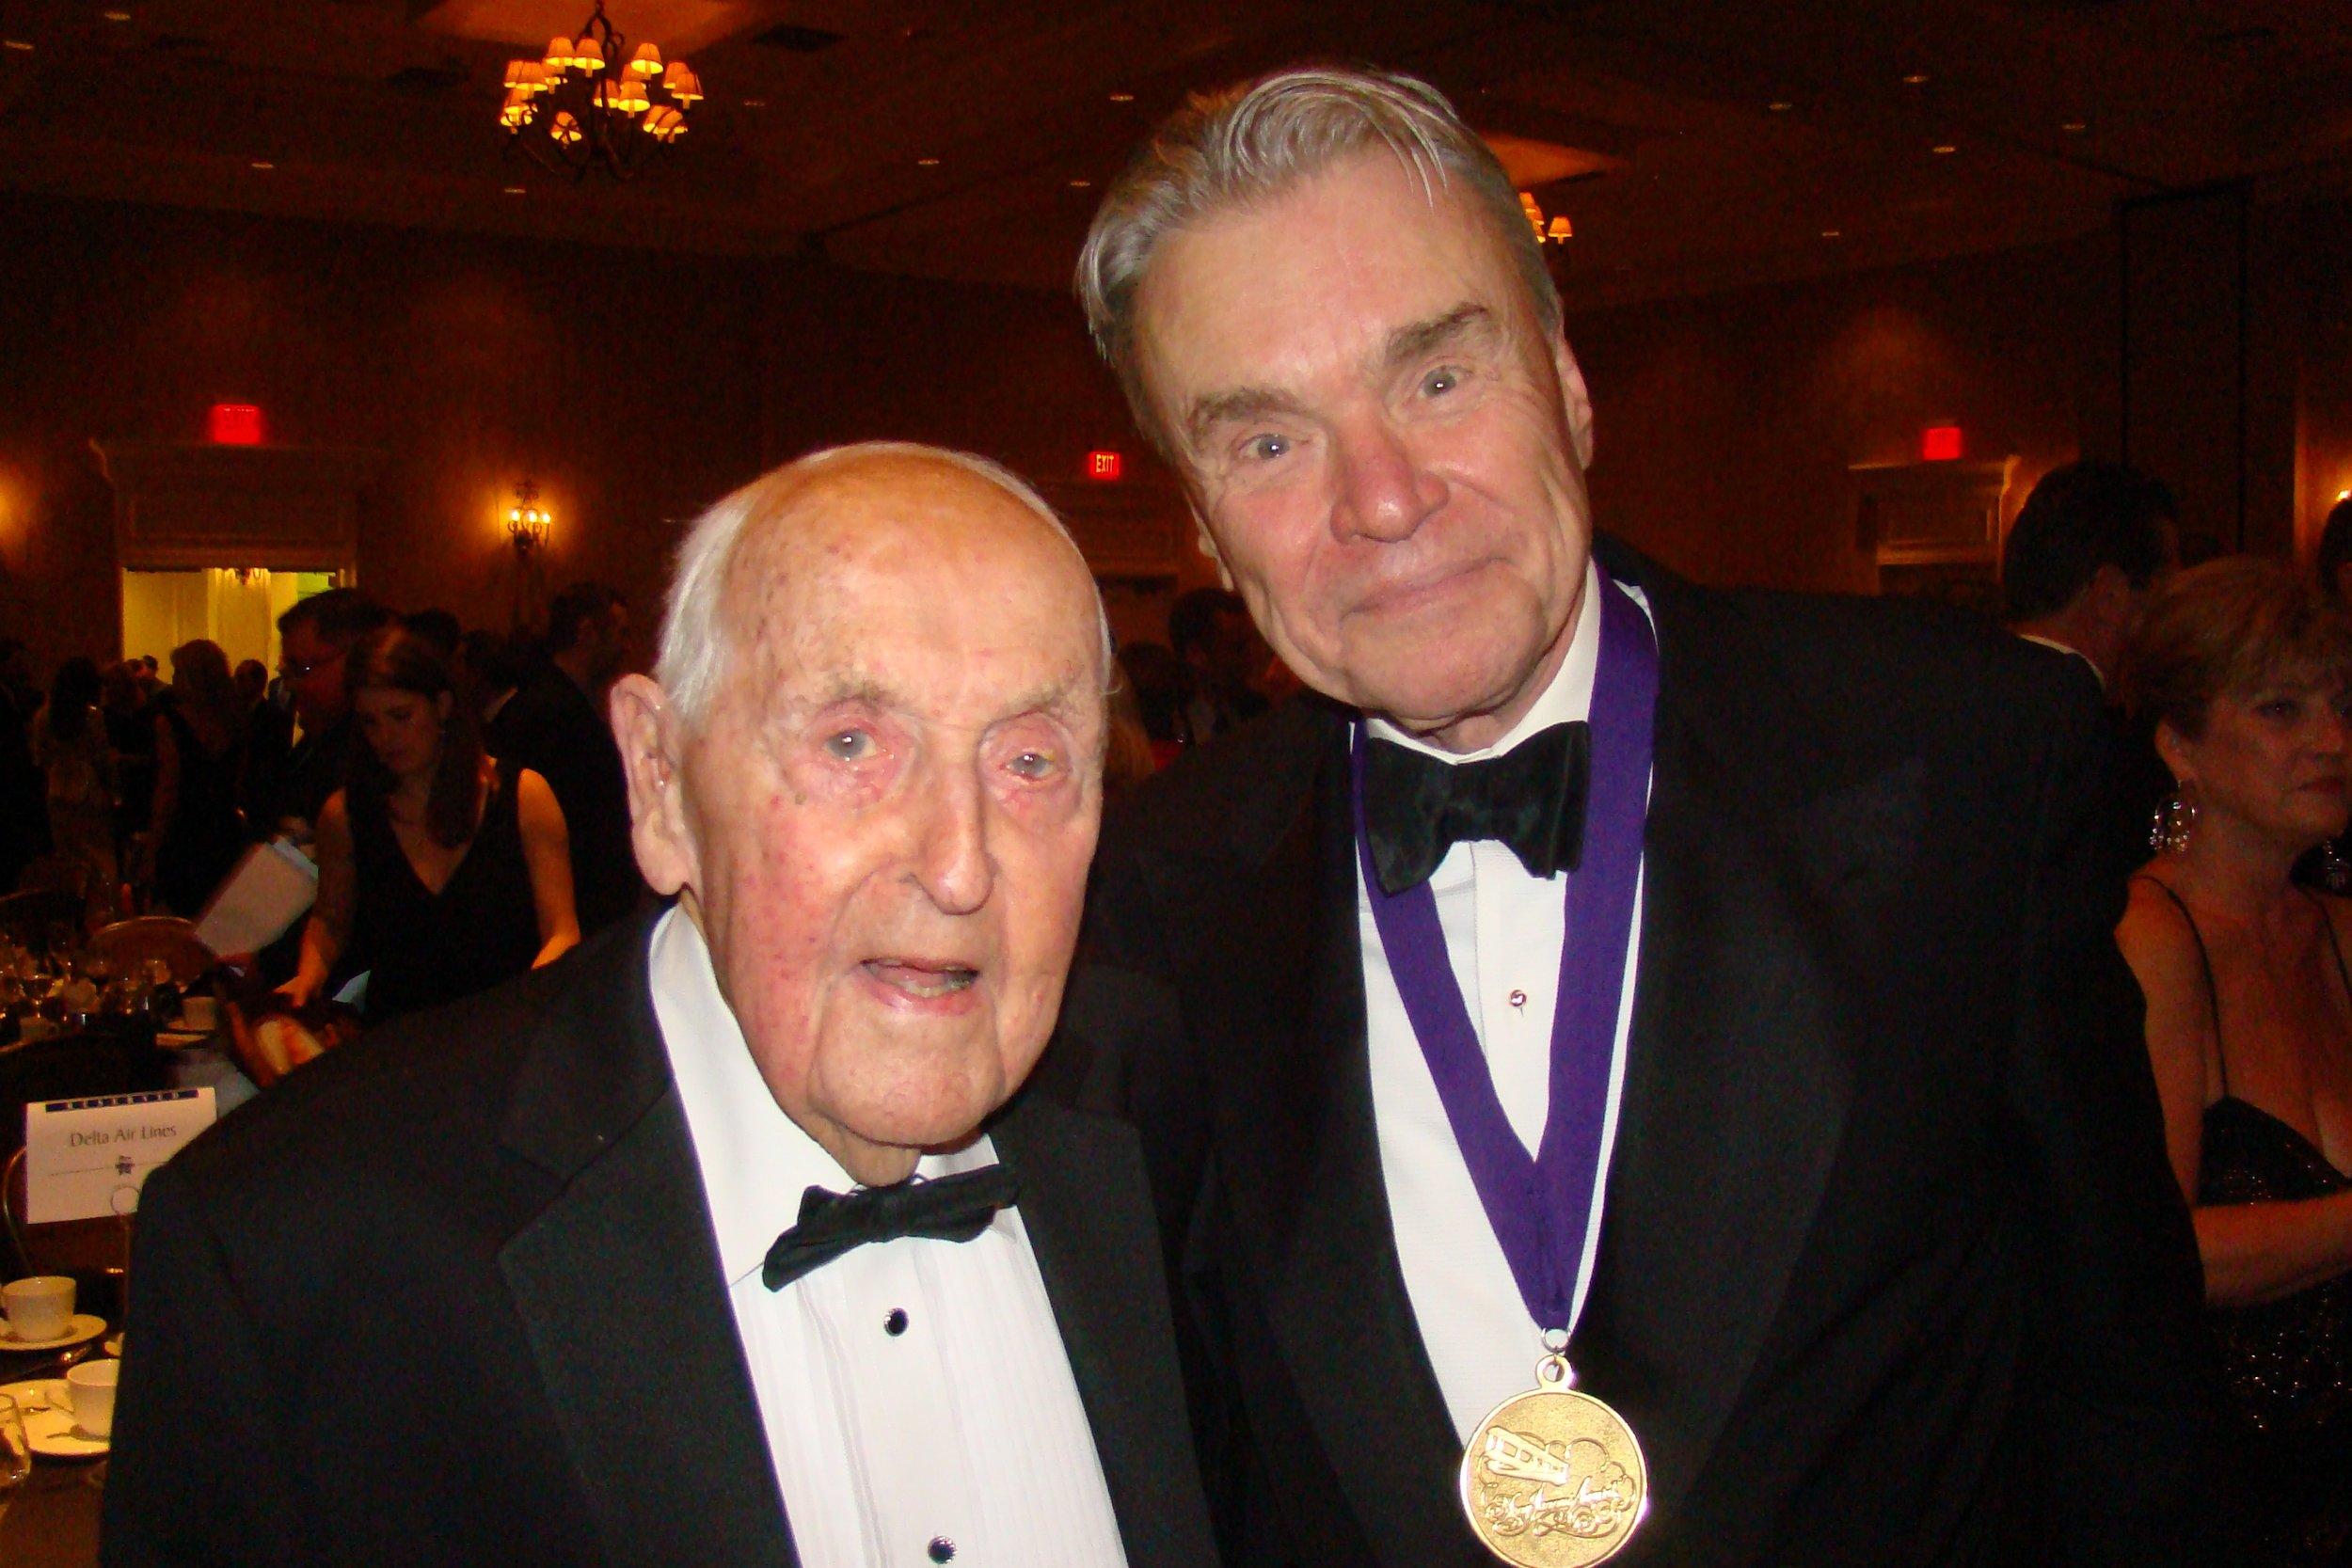 Sir Lenox Hewitt & Gordon Bethune - 1, 15 Nov '13 - Copy.JPG